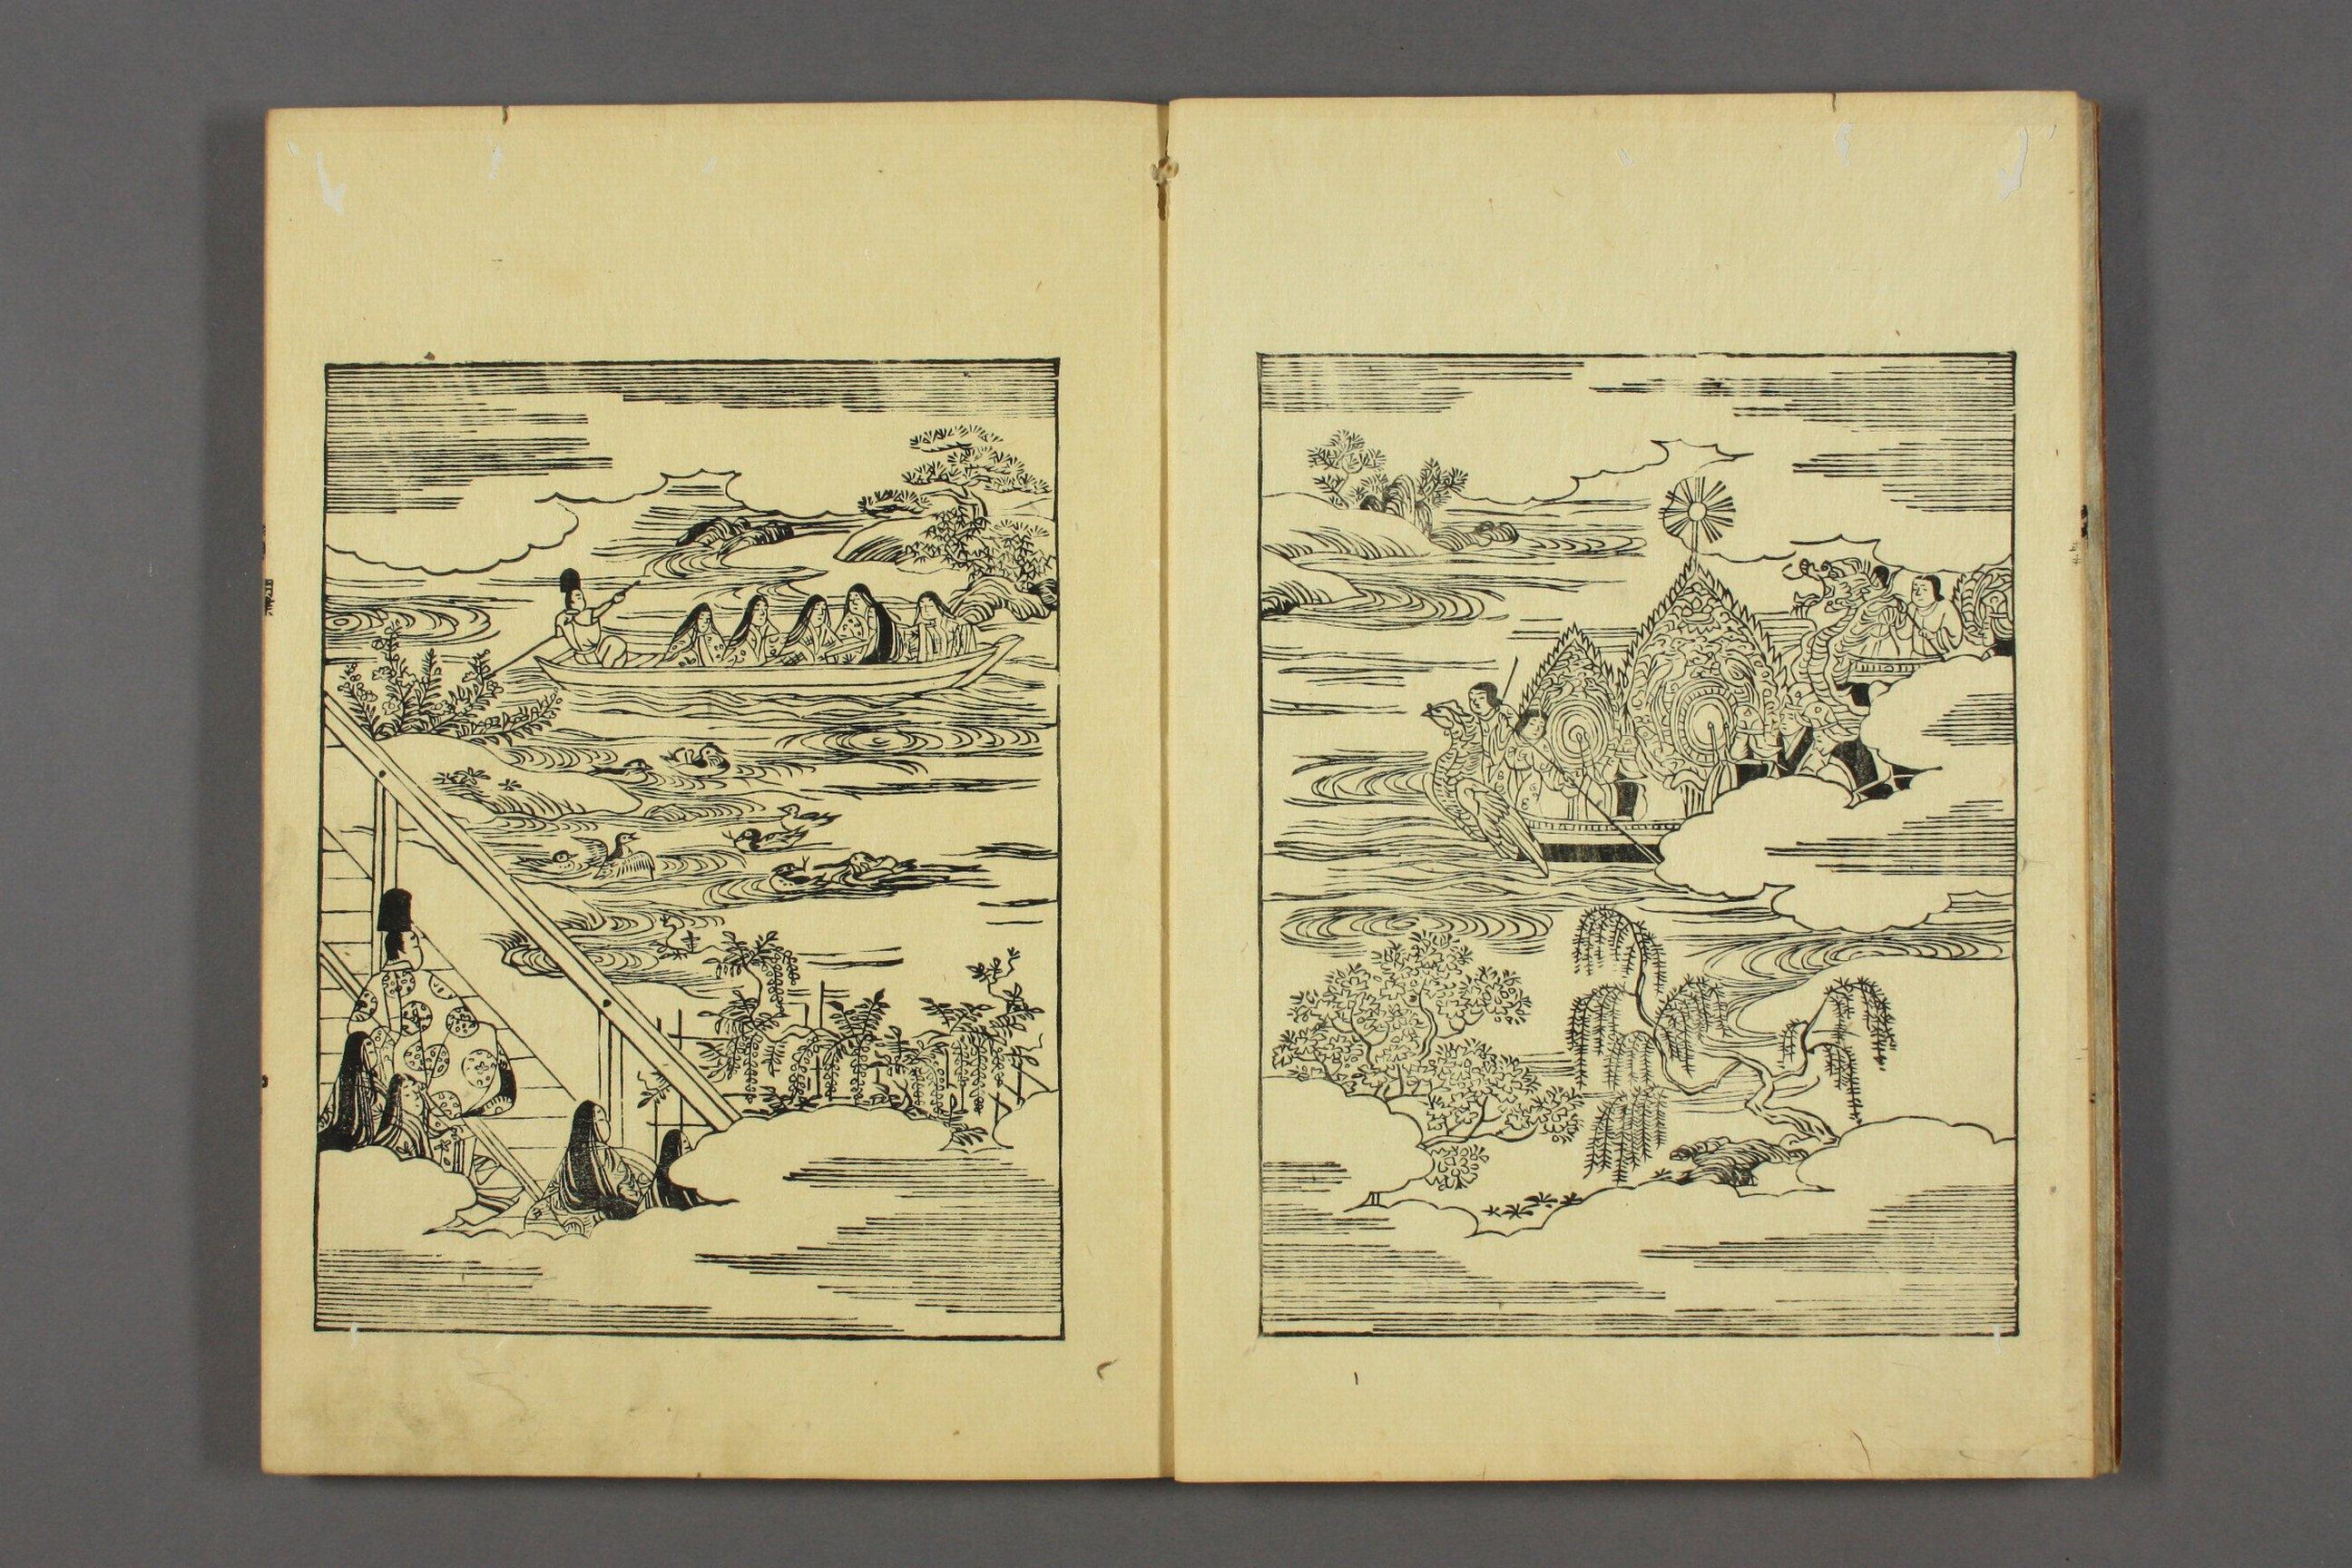 http://archive.wul.waseda.ac.jp/kosho/bunko30/bunko30_a0007/bunko30_a0007_0024/bunko30_a0007_0024_p0005.jpg